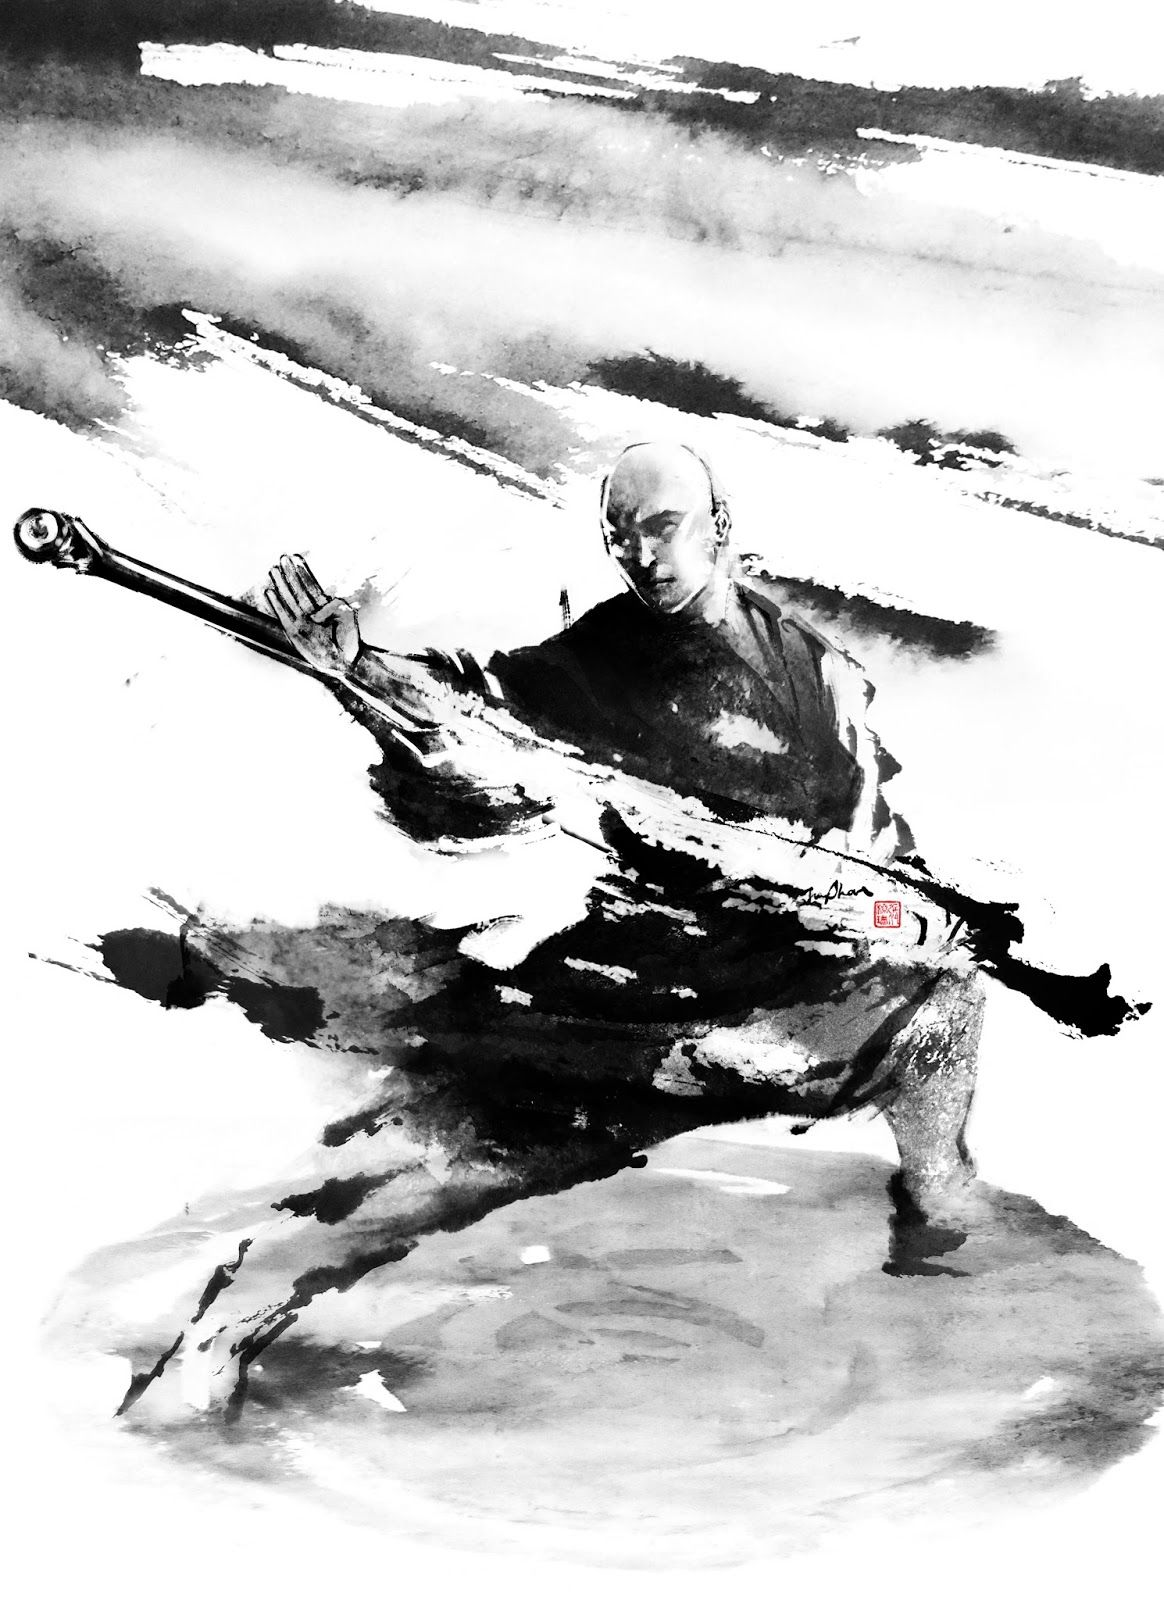 jungshan ink illustration transfert photo sur toile pinterest samourai photos sur toile. Black Bedroom Furniture Sets. Home Design Ideas